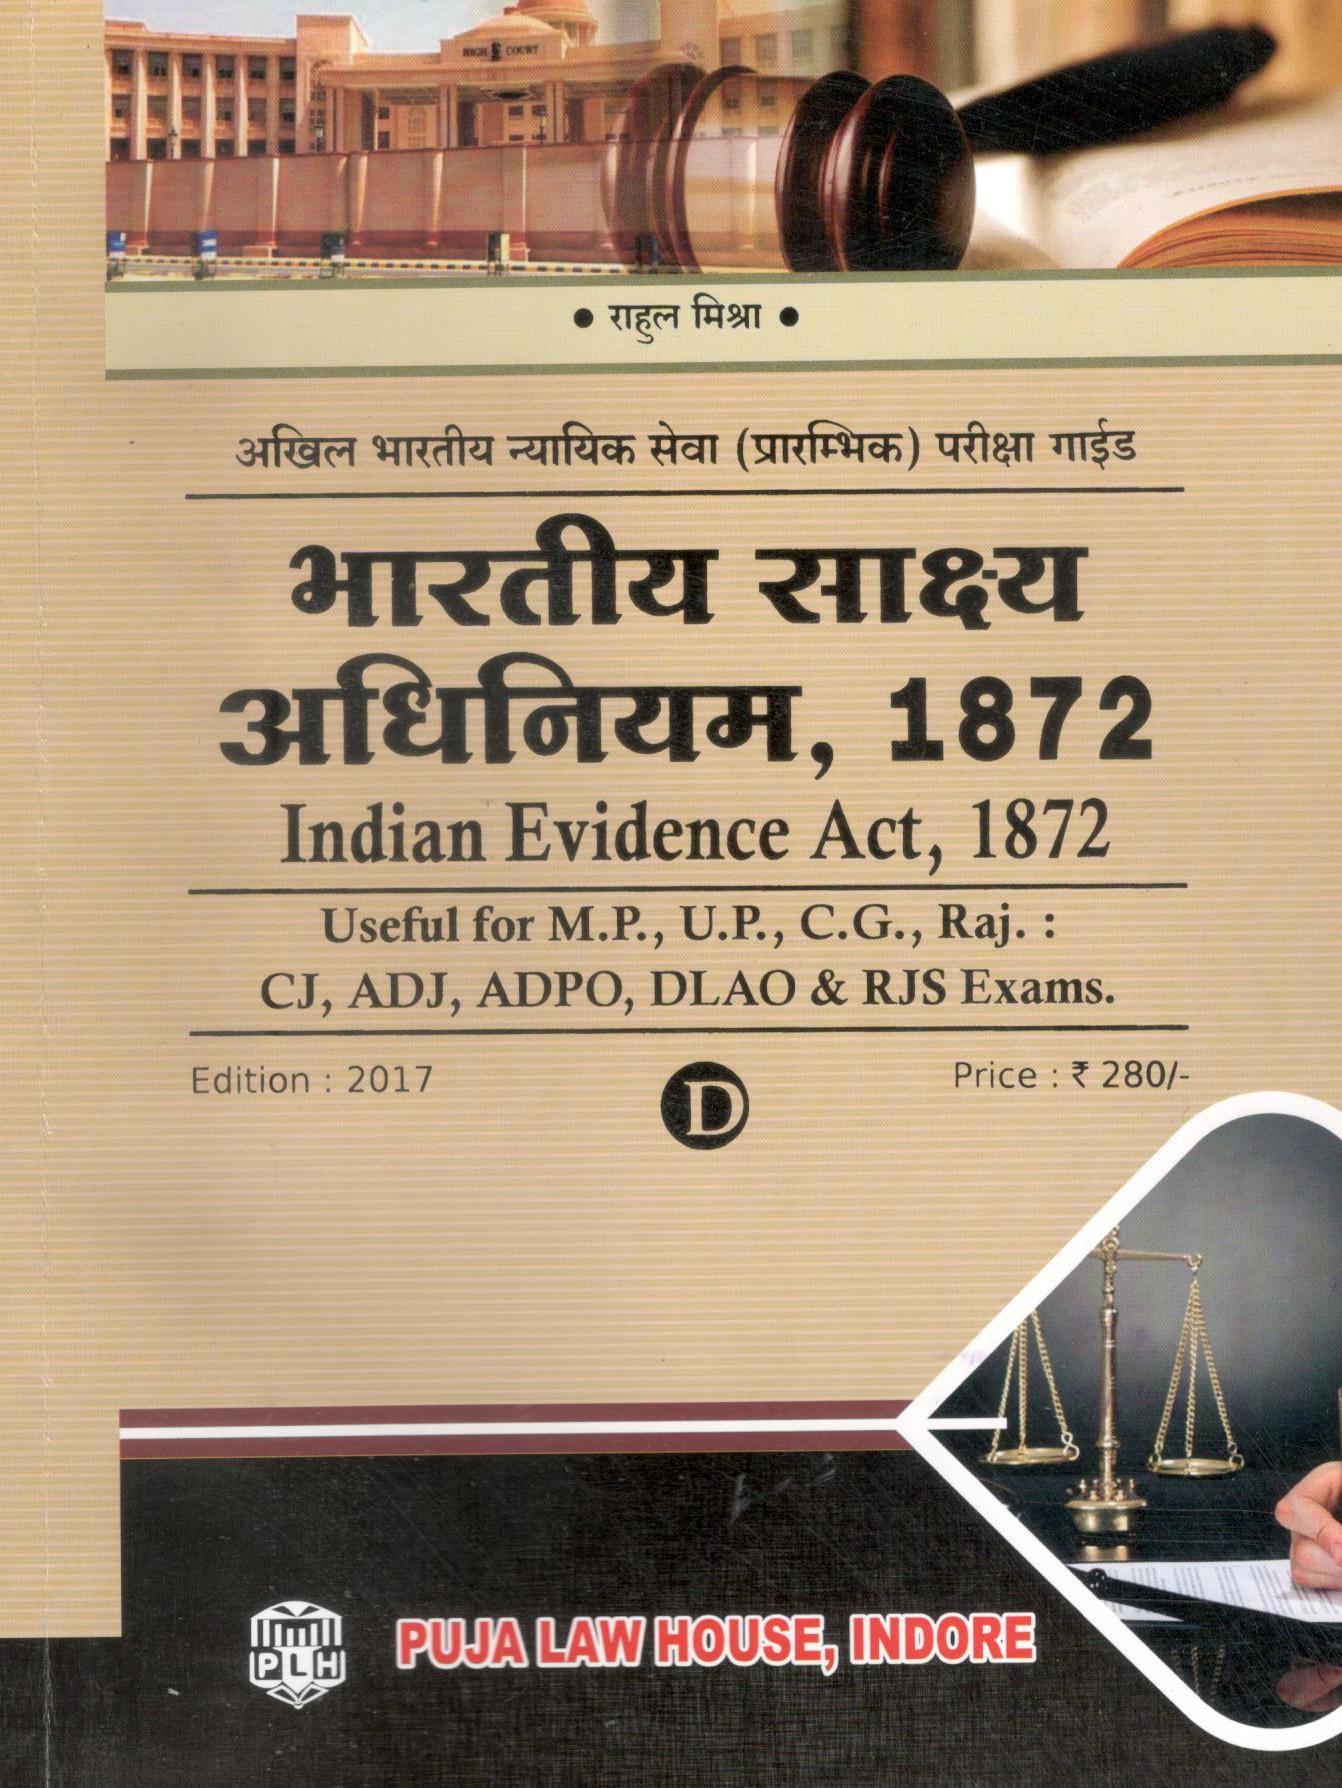 Buy राह�ल मिश�रा - भारतीय साक�ष�य अधिनियम (अखिल भारतीय न�यायिक सेवा  (प�रारंभिक) परीक�षा गाइड) / Indian Evidence Act (All India Judicial Services (Preliminary) Exam Guide)